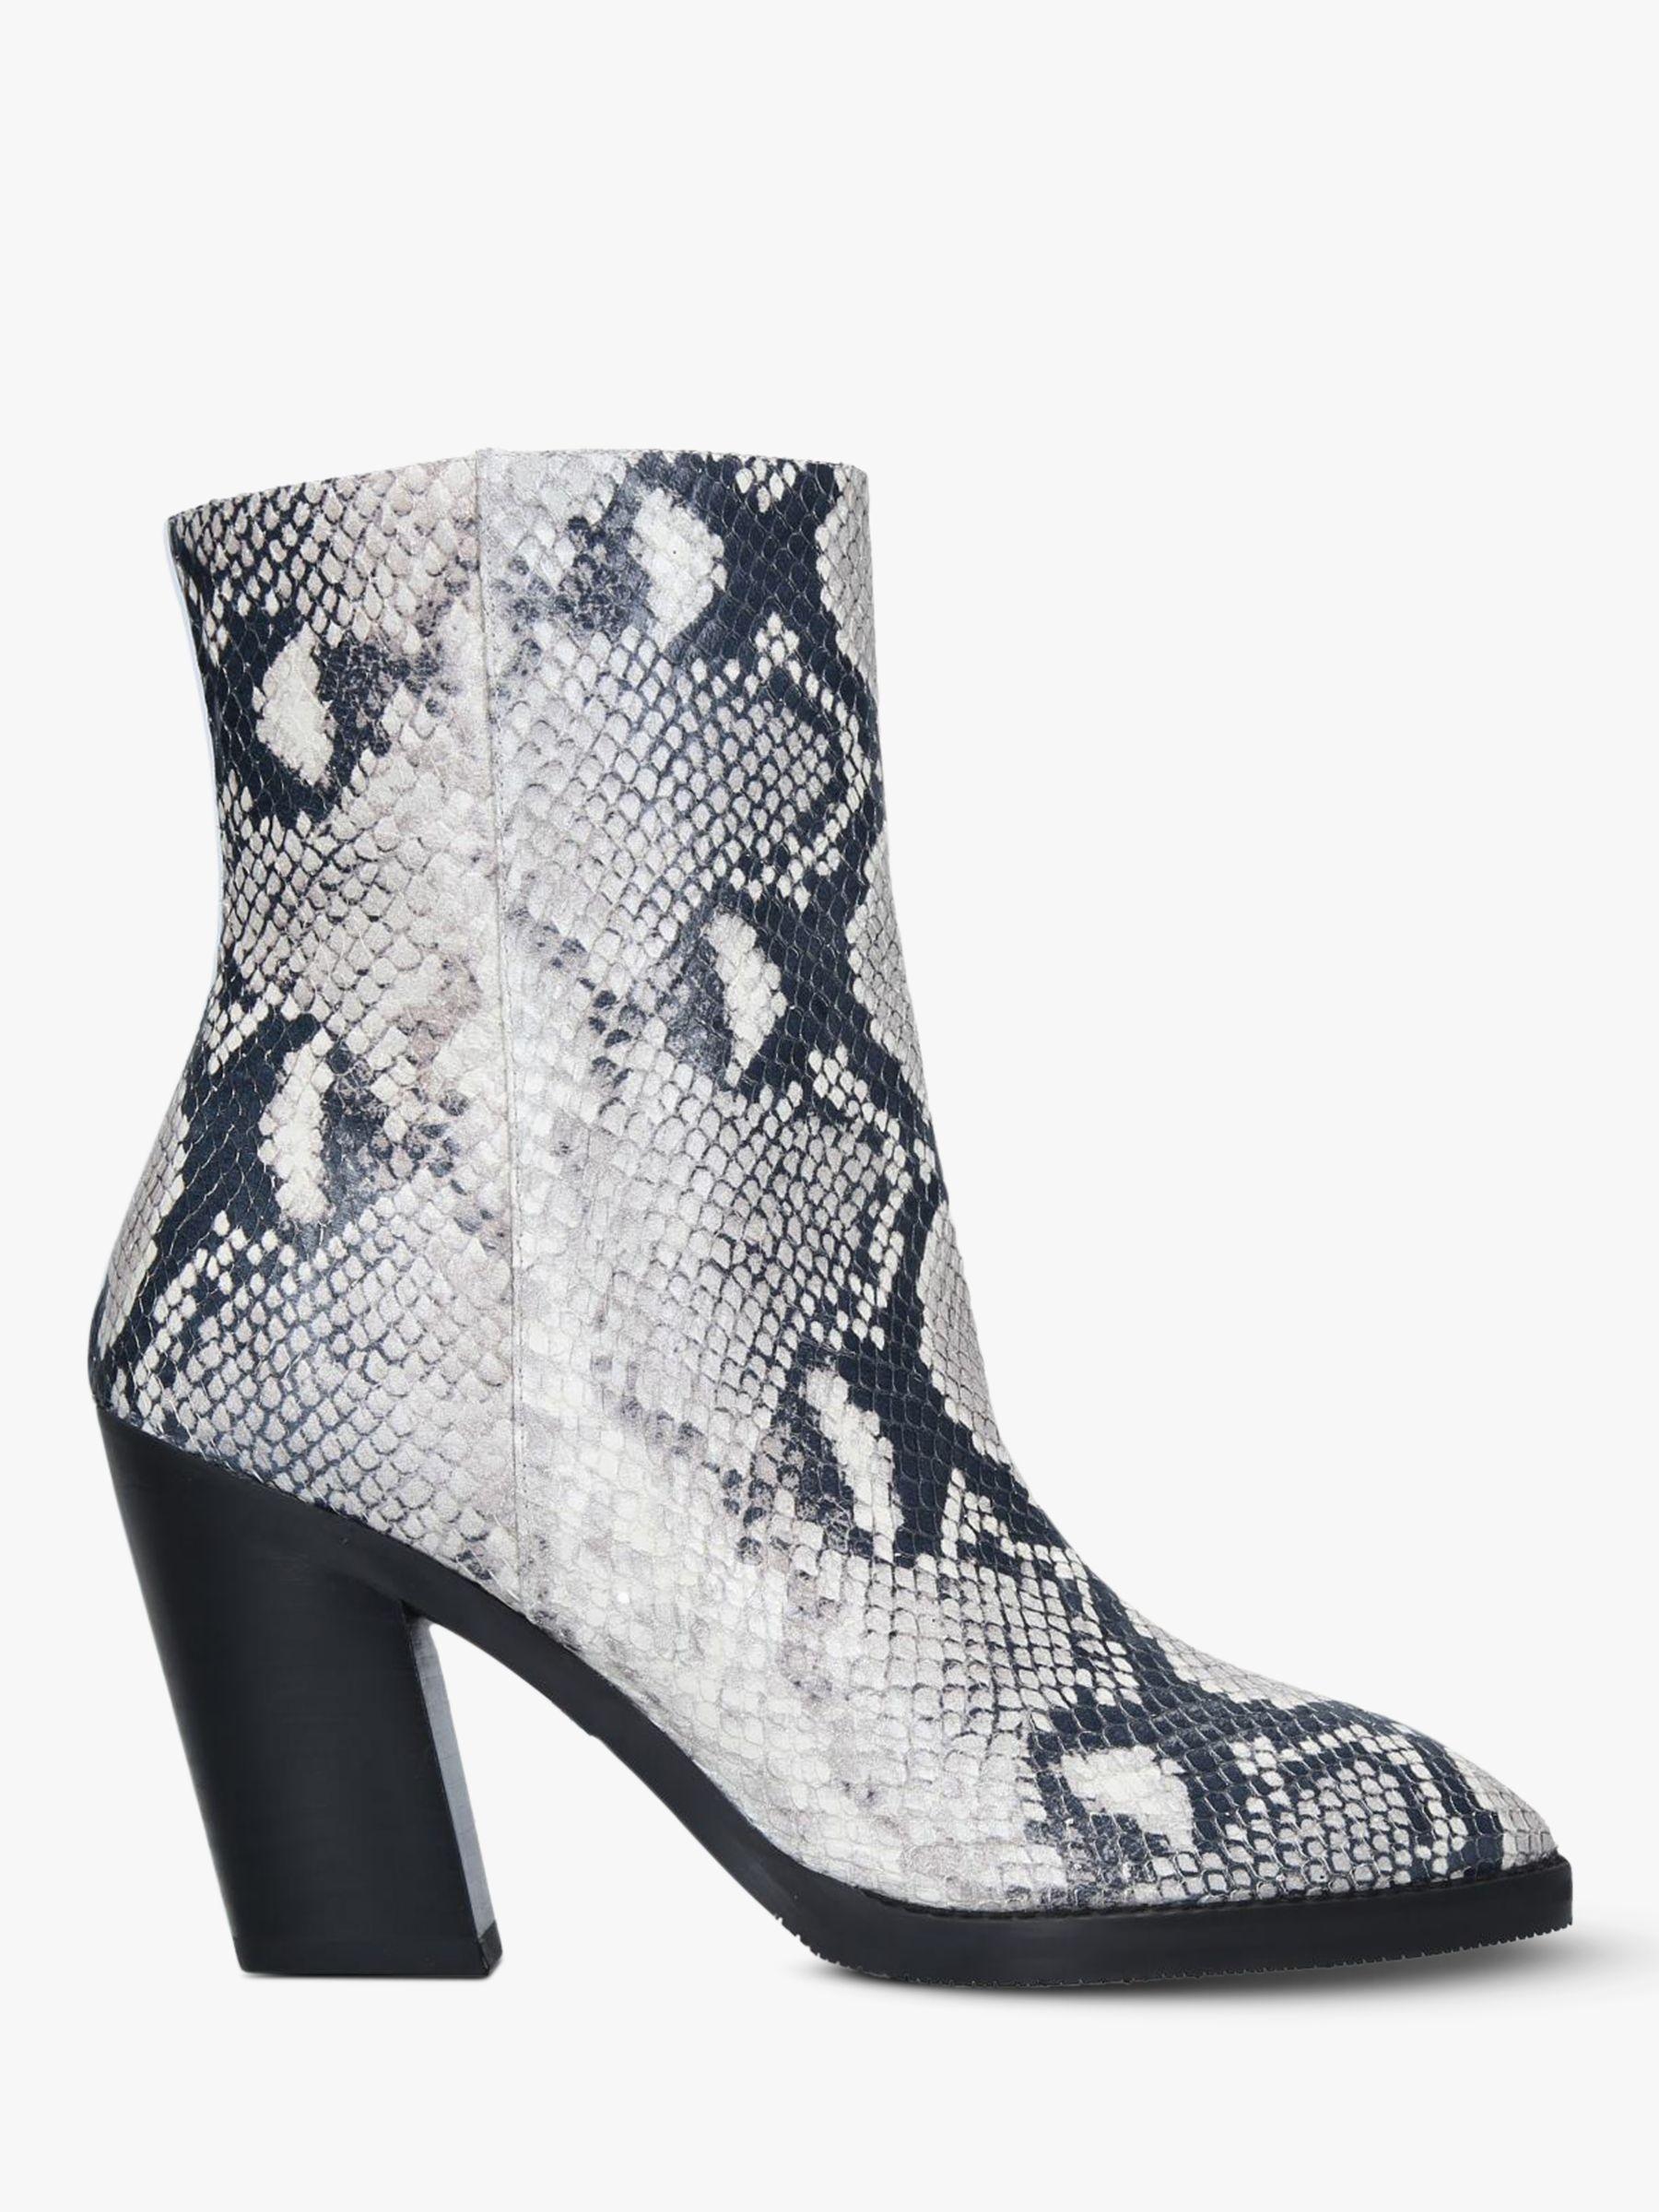 Stuart Weitzman Stuart Weitzman Wynter Snake Print Ankle Boots, Natural